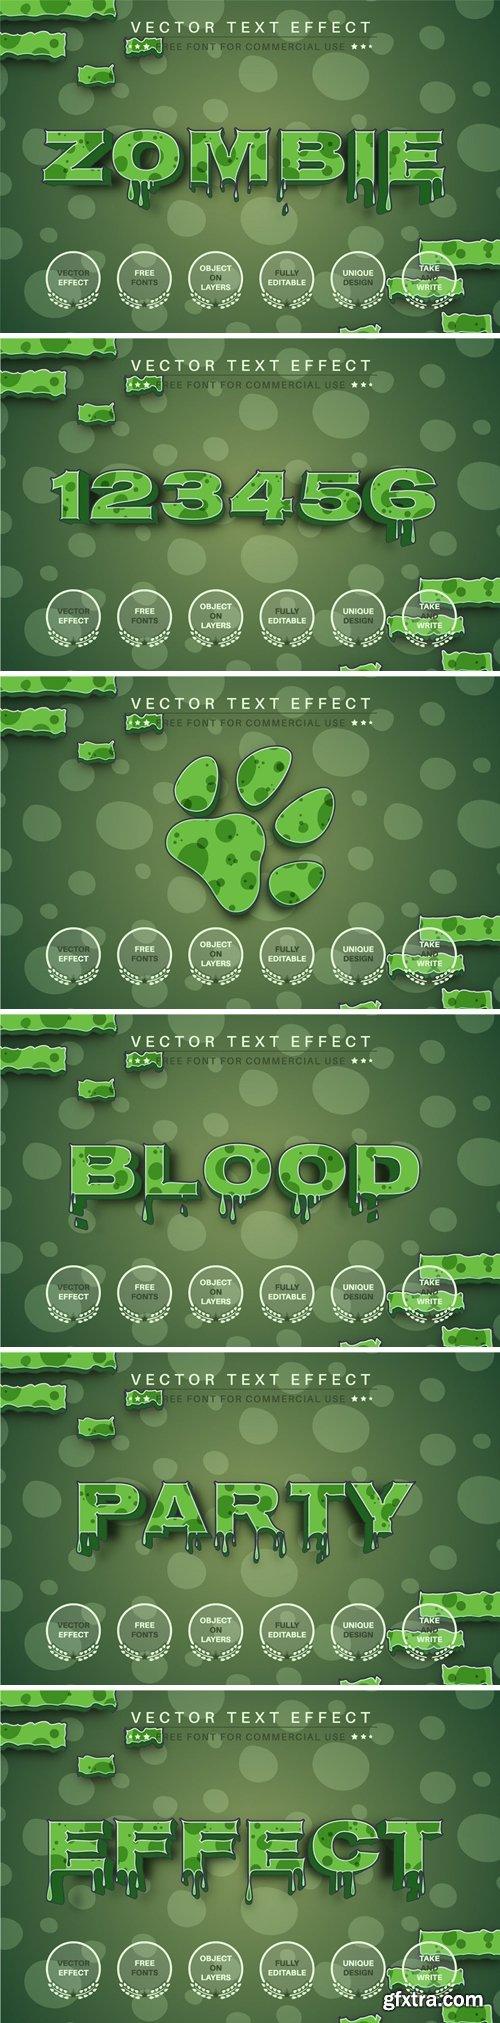 Zombie 3D - Editable Text Effect, Font Style